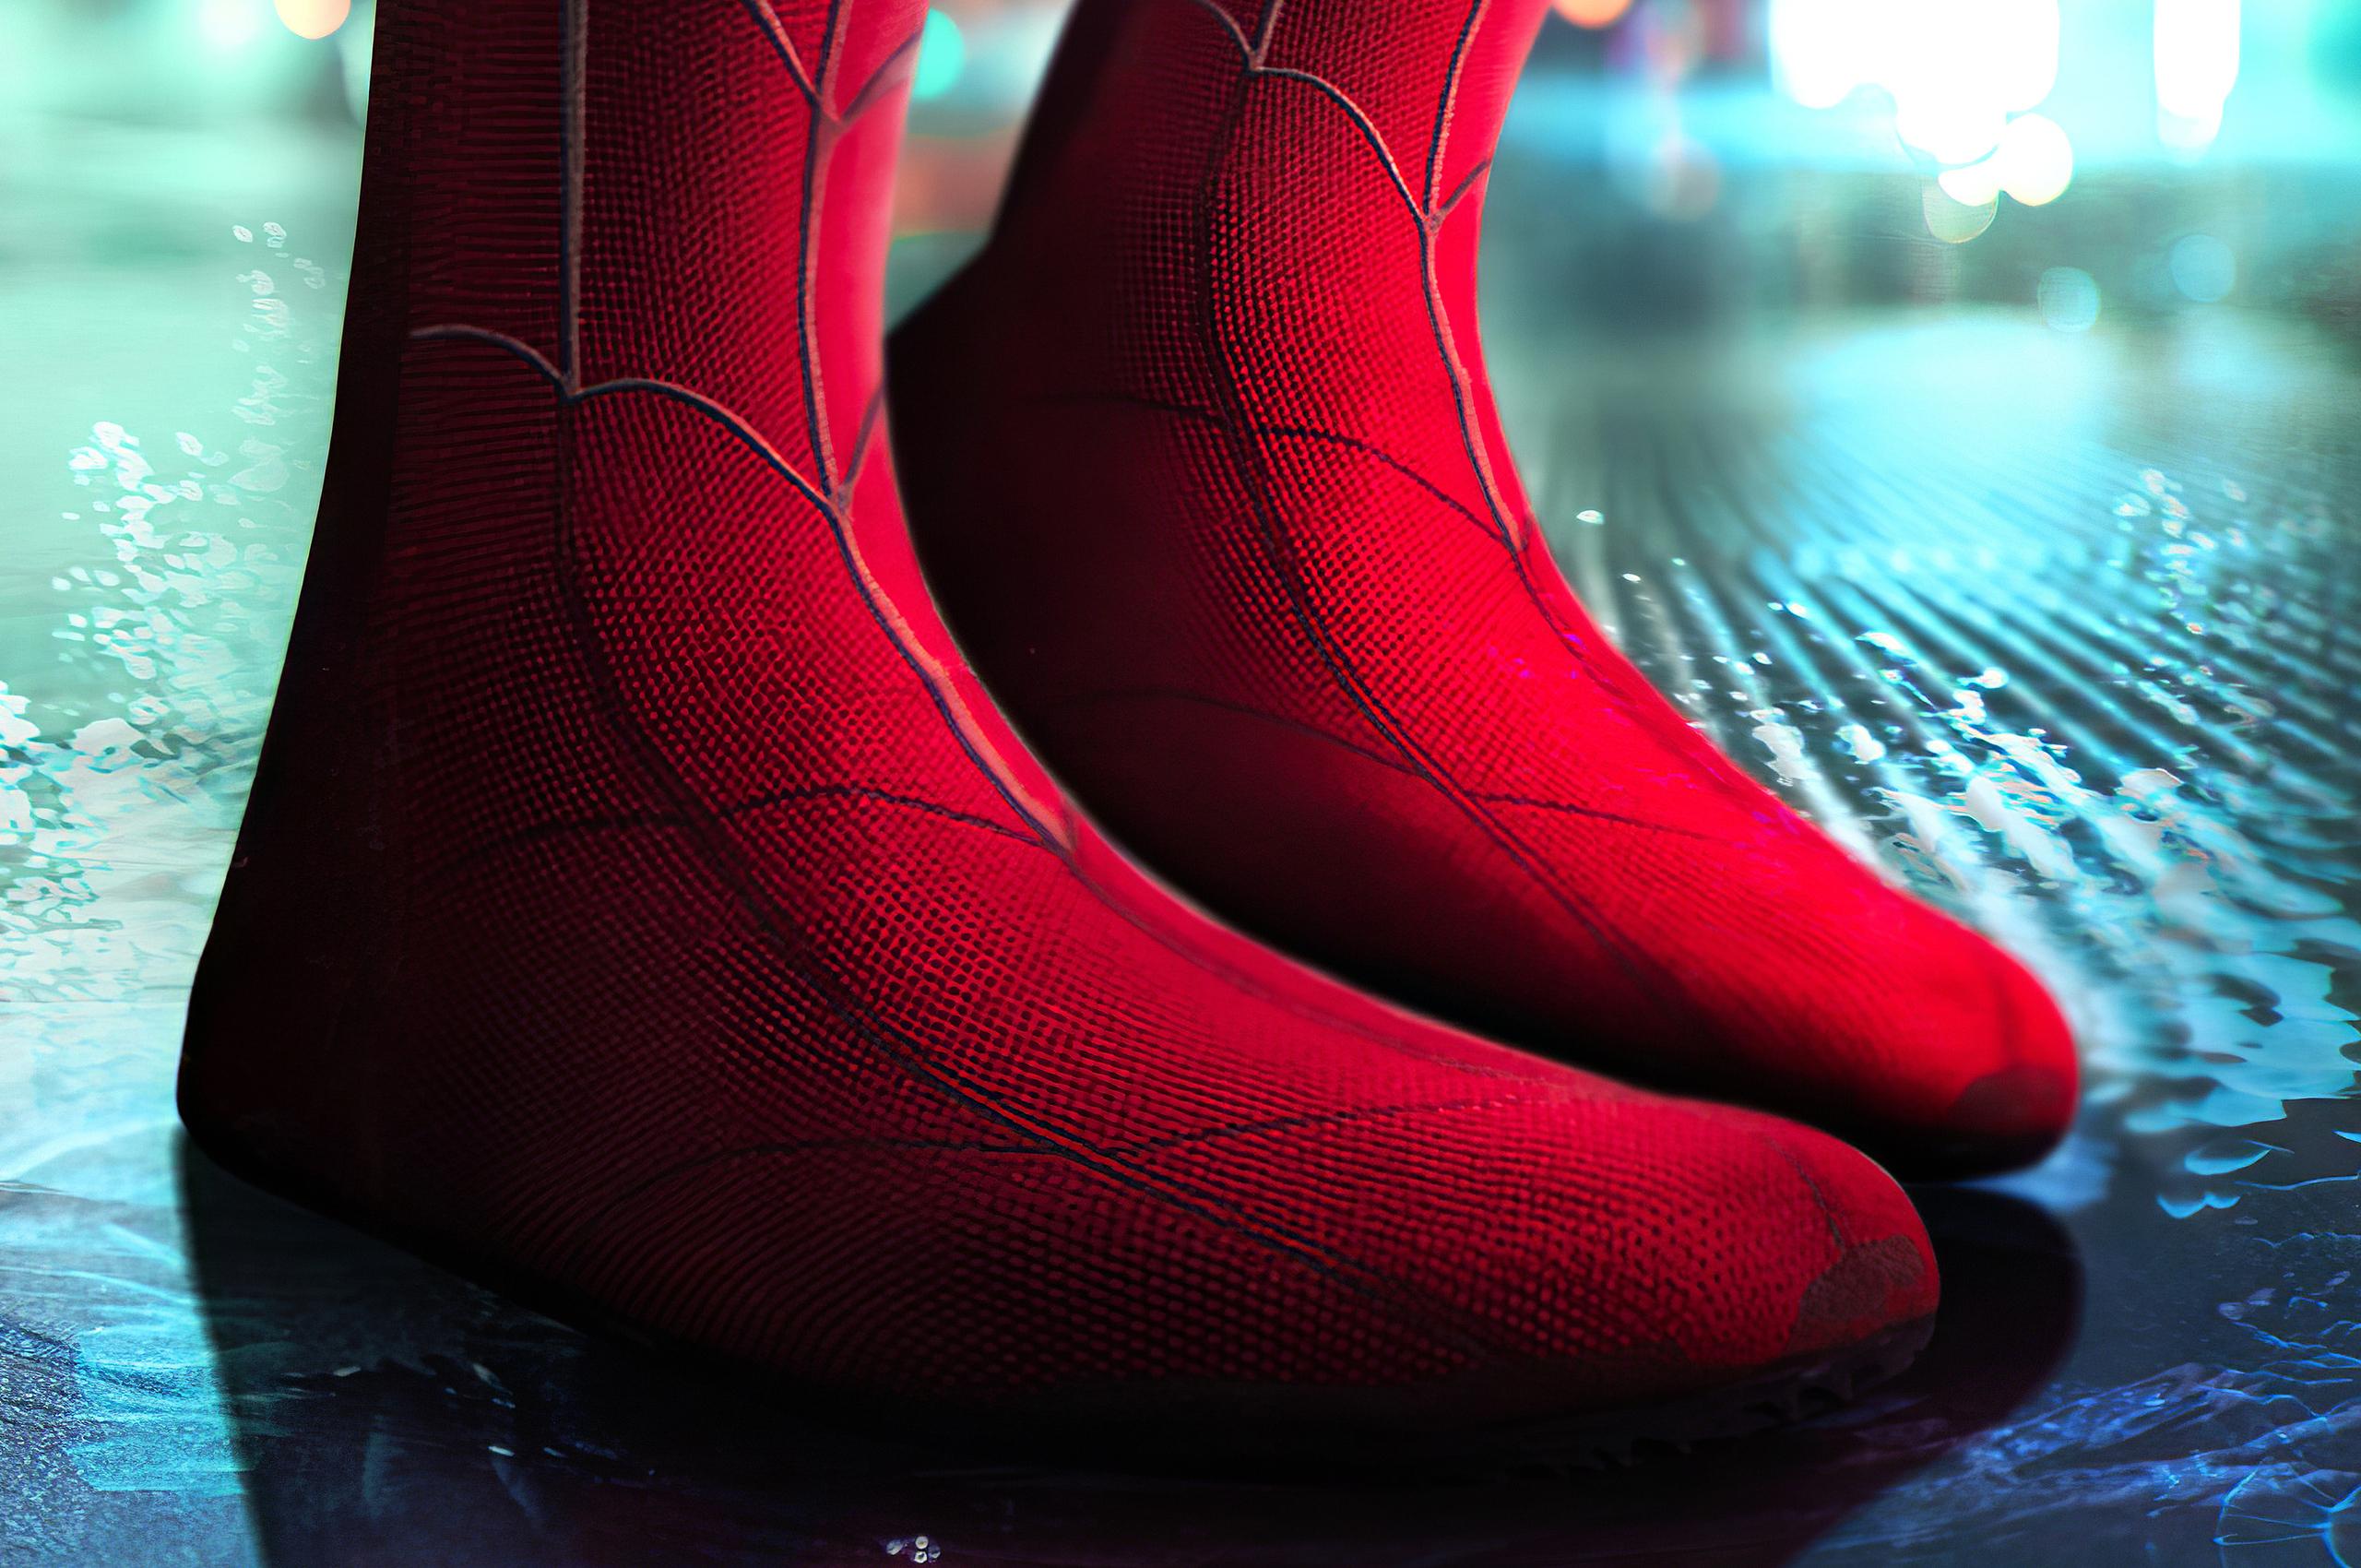 spiderman-homecoming-boots-4k-se.jpg